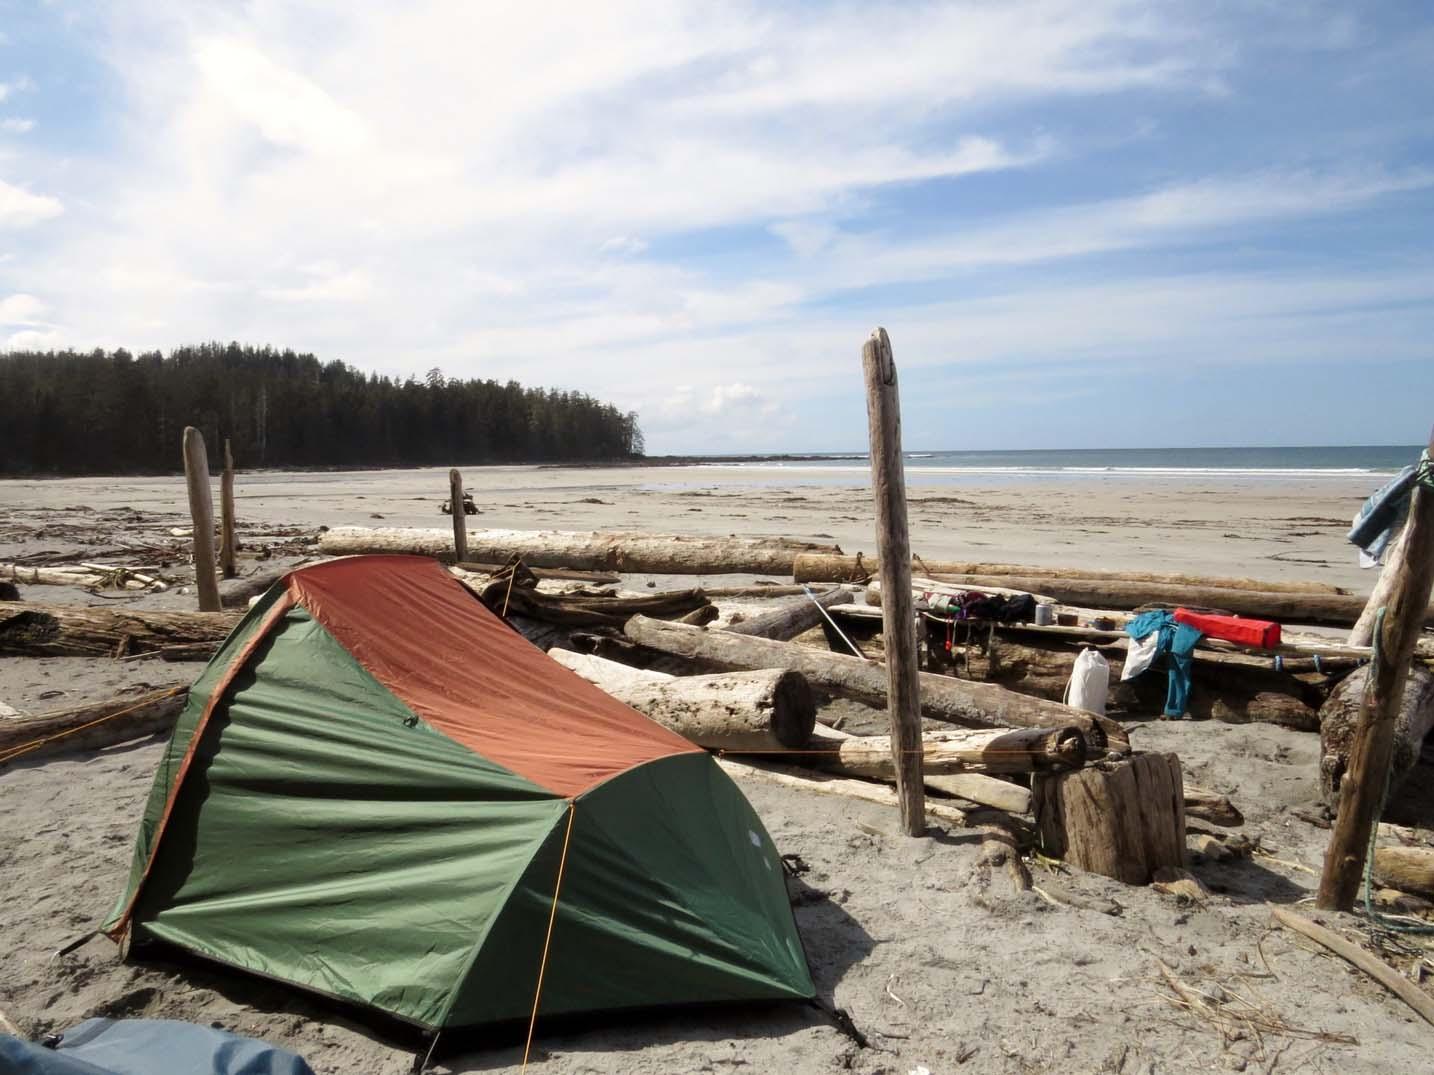 Cape-Scott-Provincial-Park-hike-Nels-Bight-camping